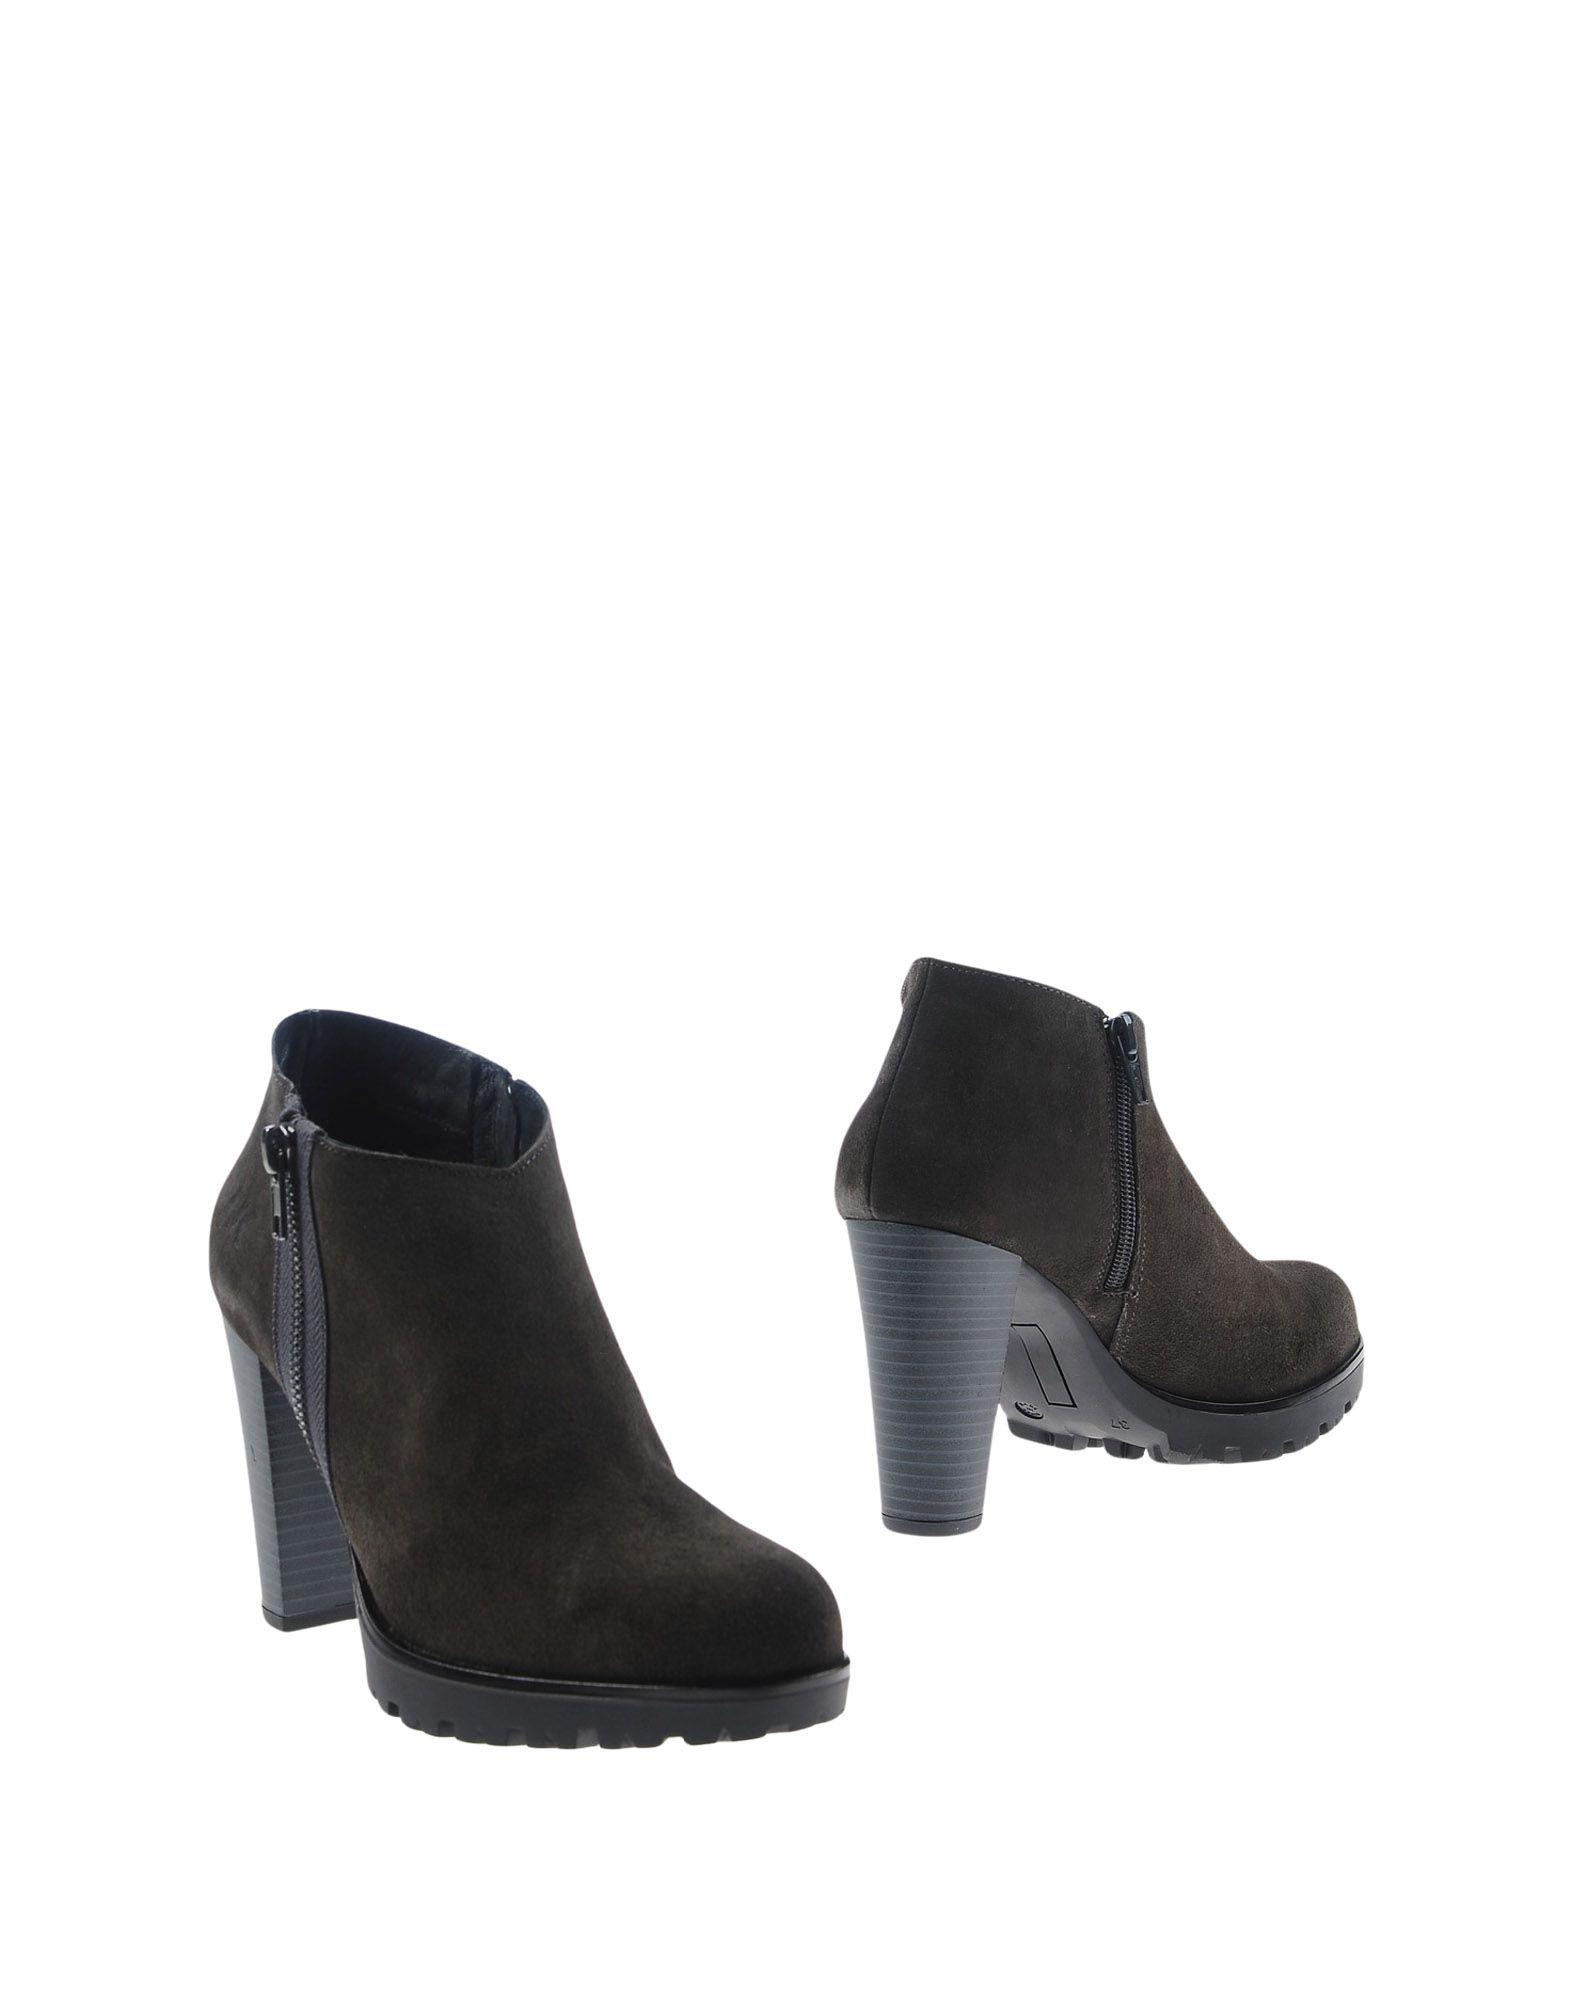 Lumberjack Stiefelette Damen  11288640GF Gute Qualität beliebte Schuhe